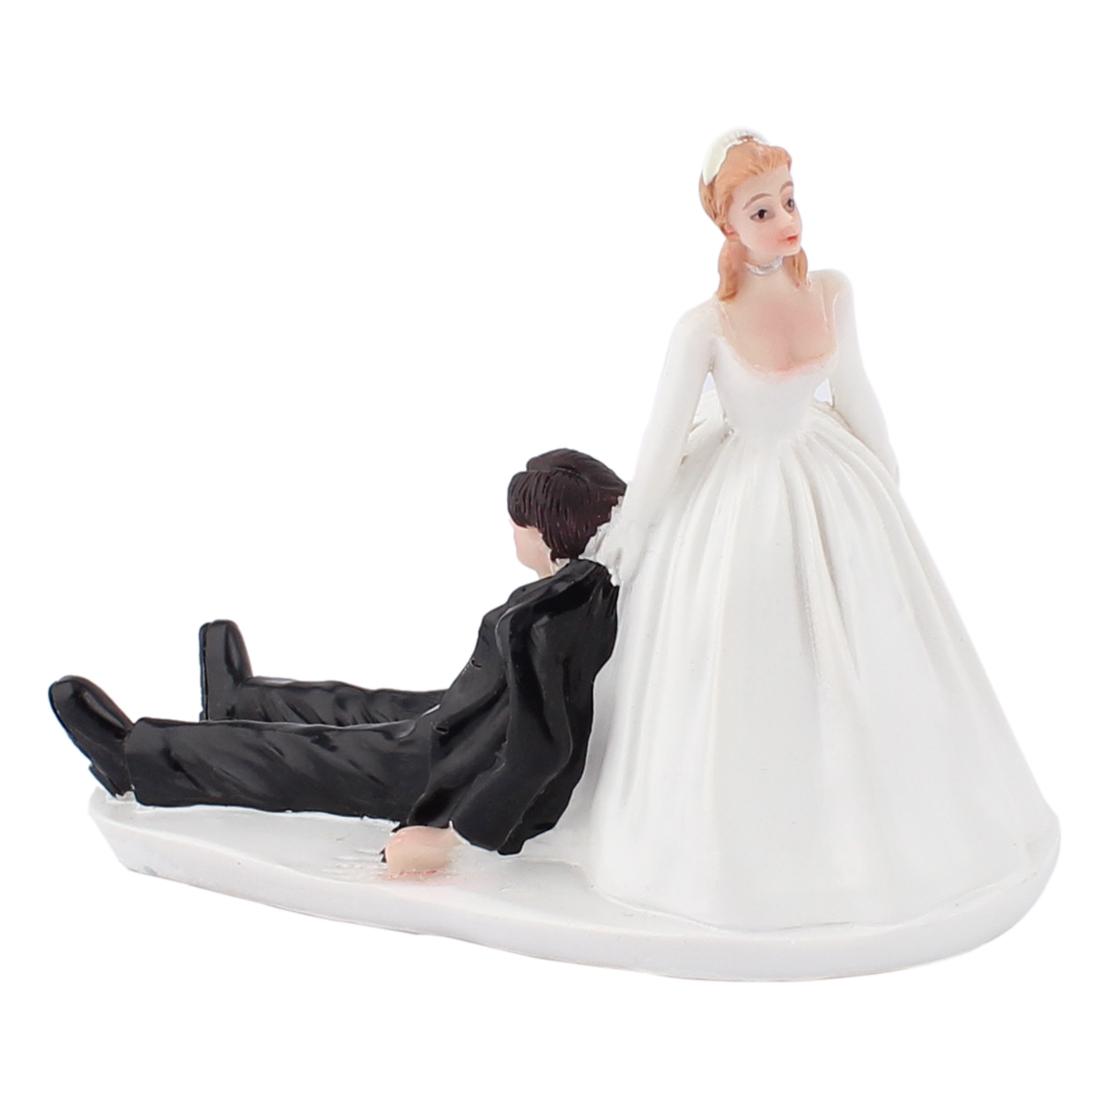 Bride Pulling The Drunk Groom Humor Figurine Wedding Cake Topper Decoration Gift